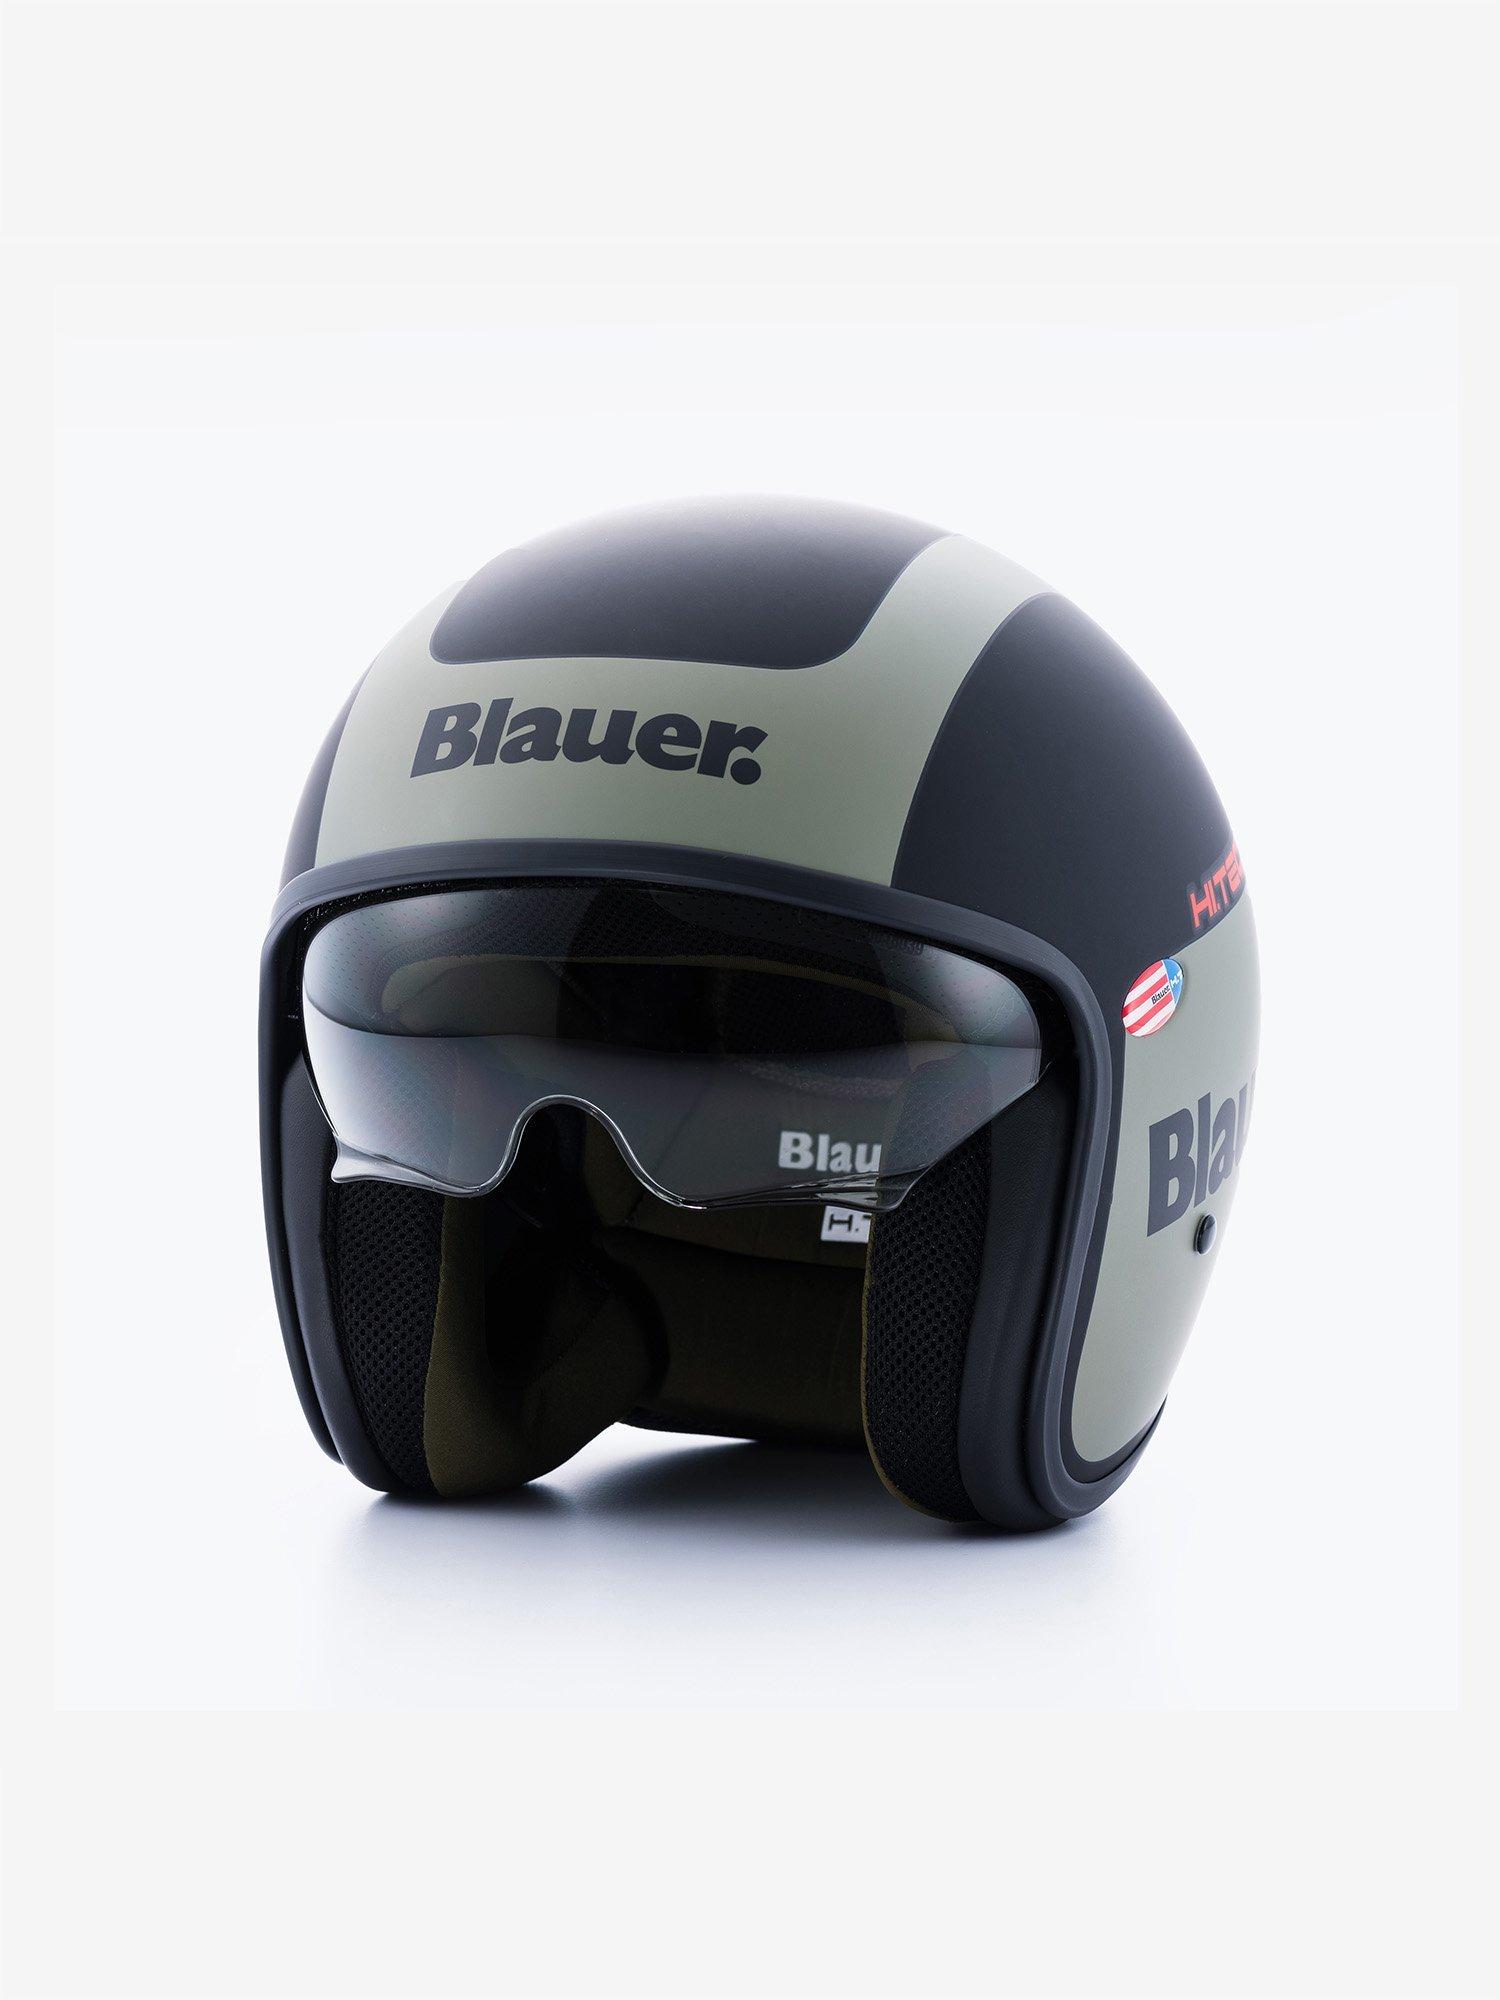 Blauer - PILOT 1.1 BICOLORE OPACO - Black Matt / Green In. Green - Blauer